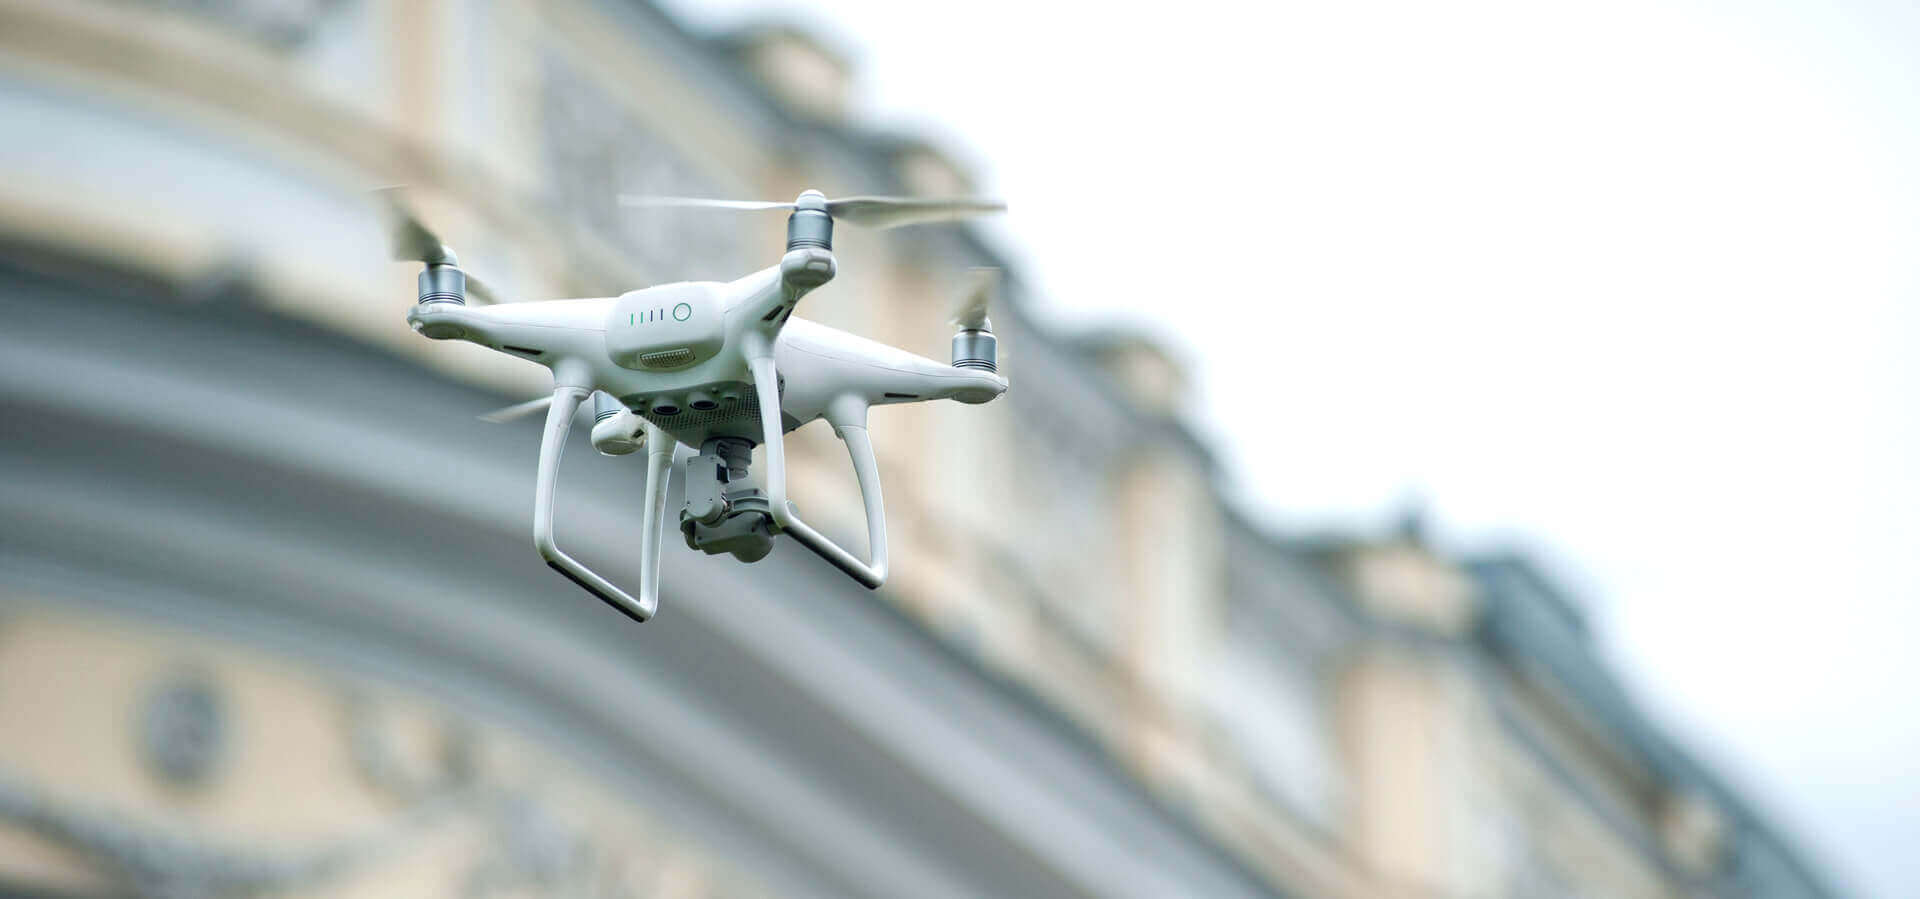 Iron Background Drone